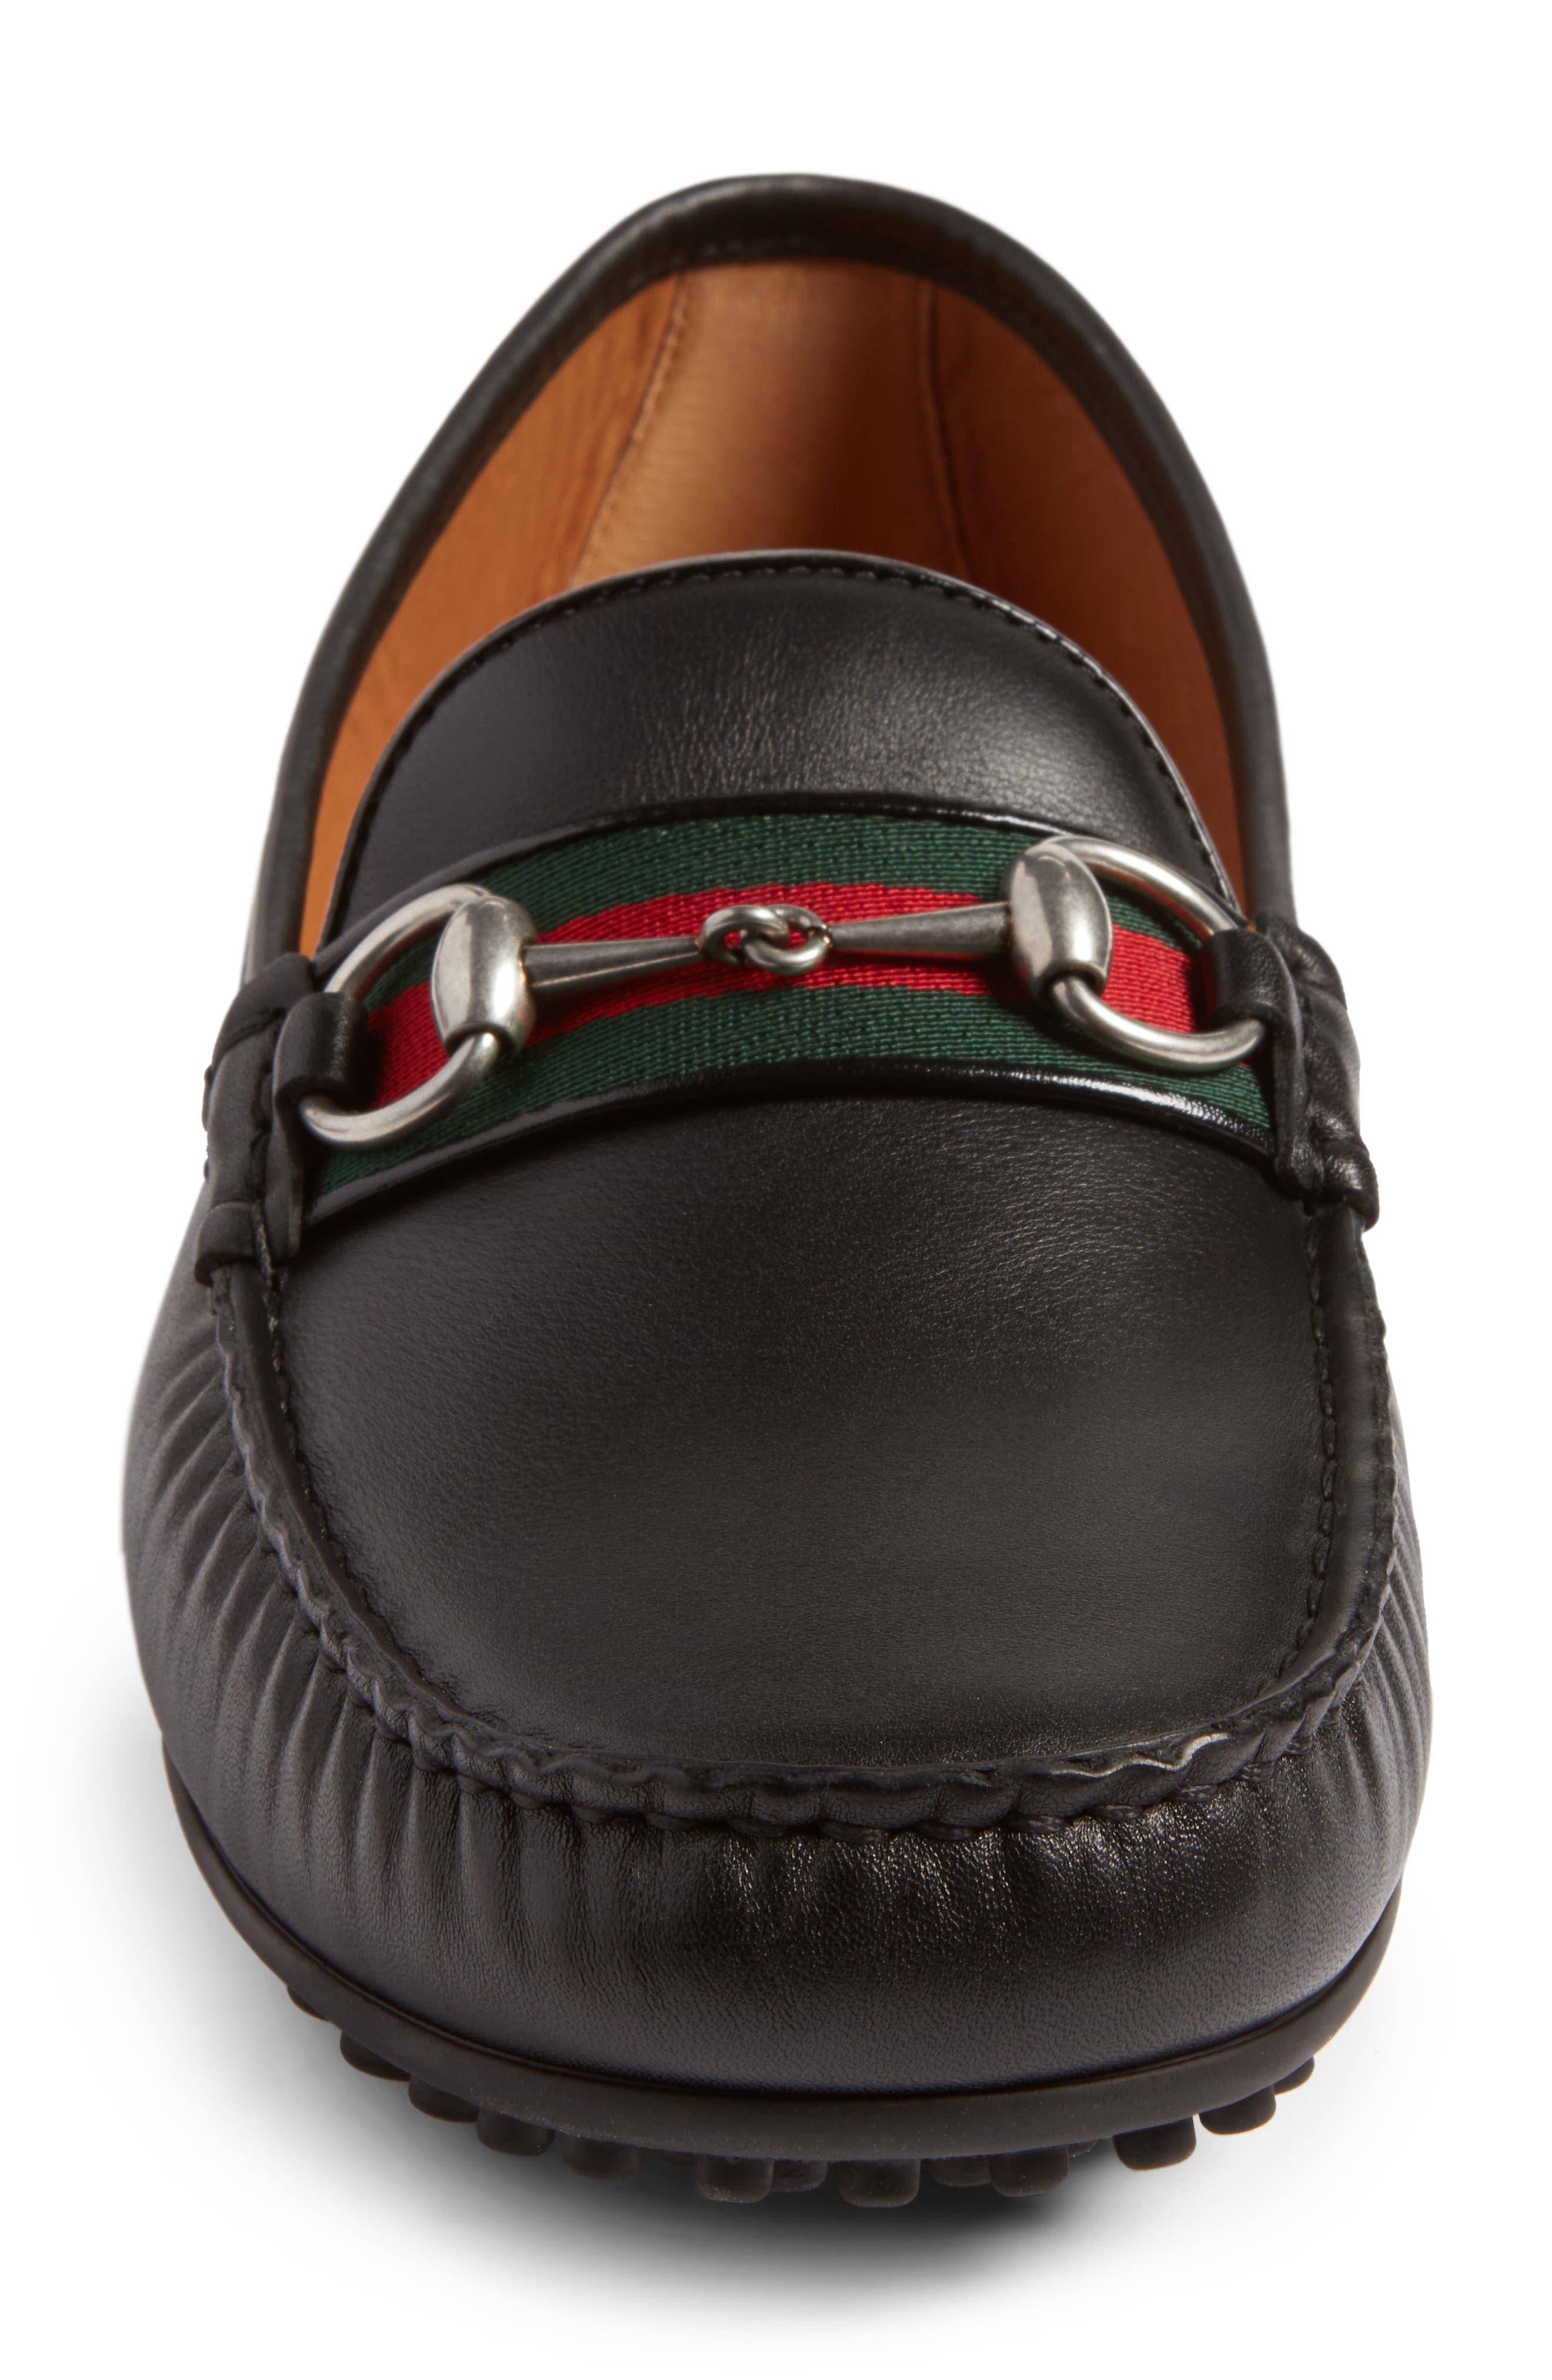 Kanye Bit Loafer,                             Alternate thumbnail 4, color,                             Nero Leather